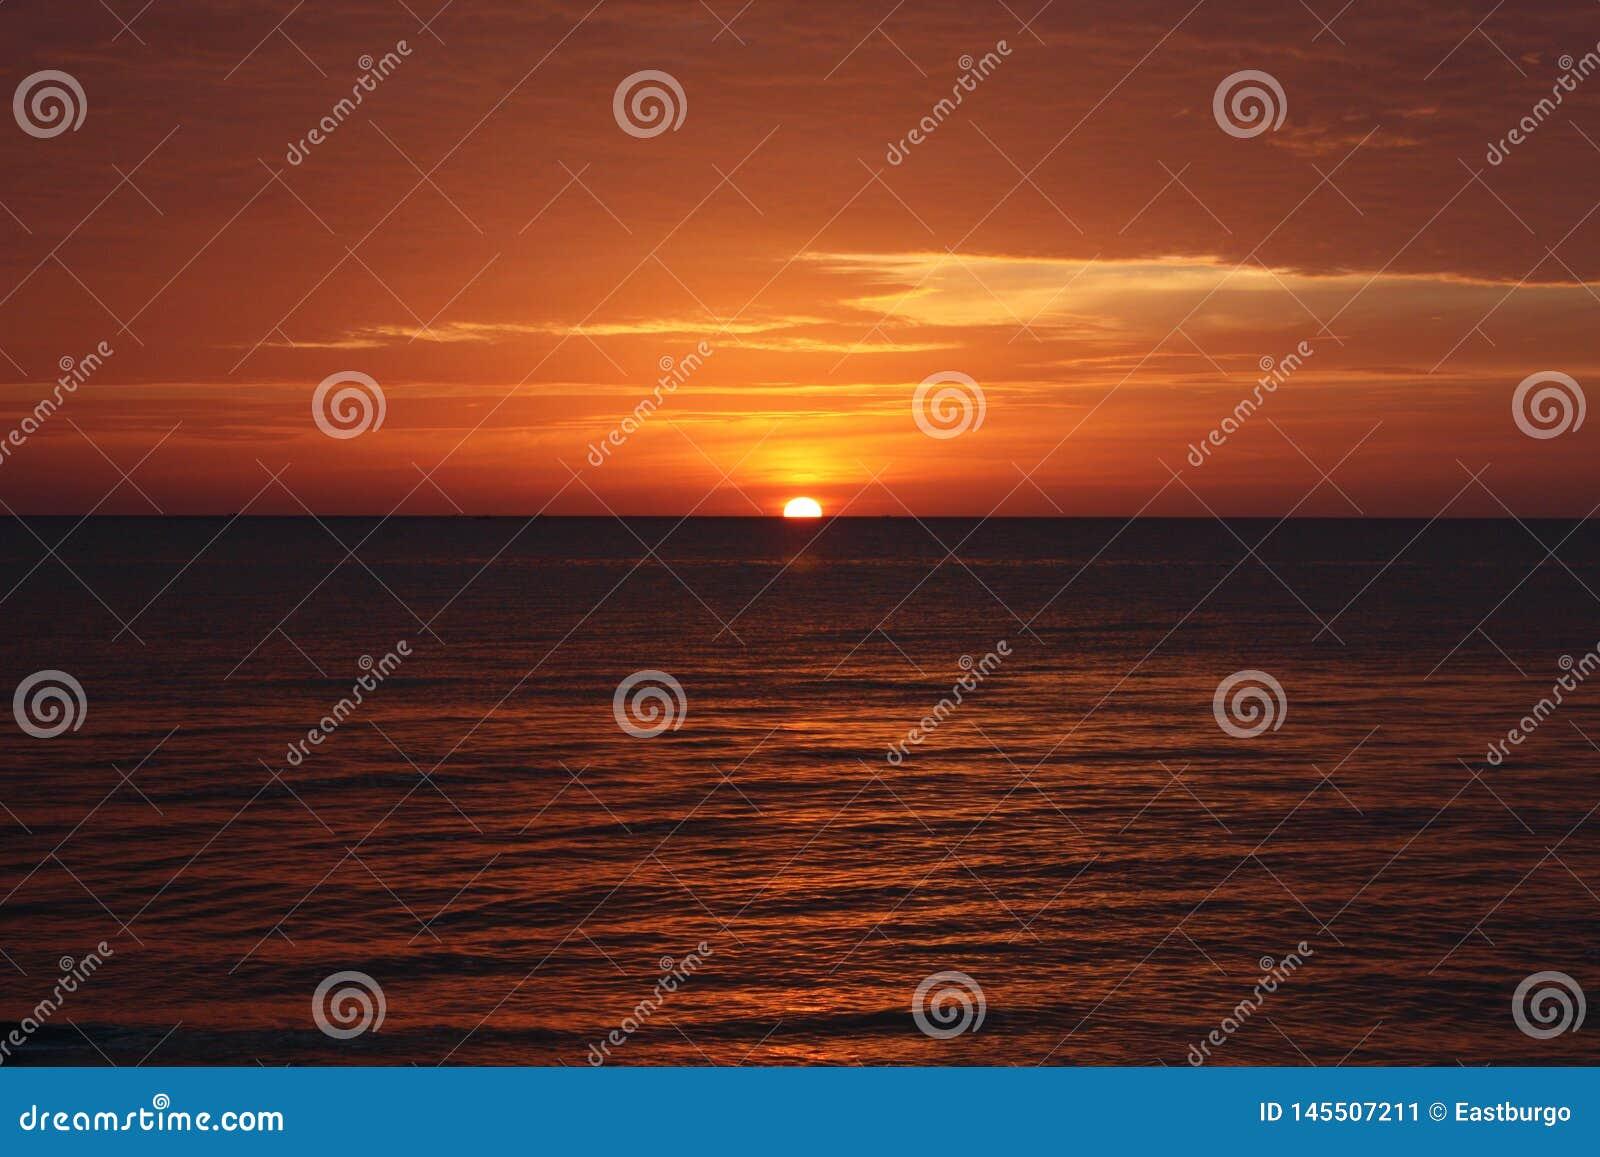 Roter Sonnenuntergang ?ber dem Ozean